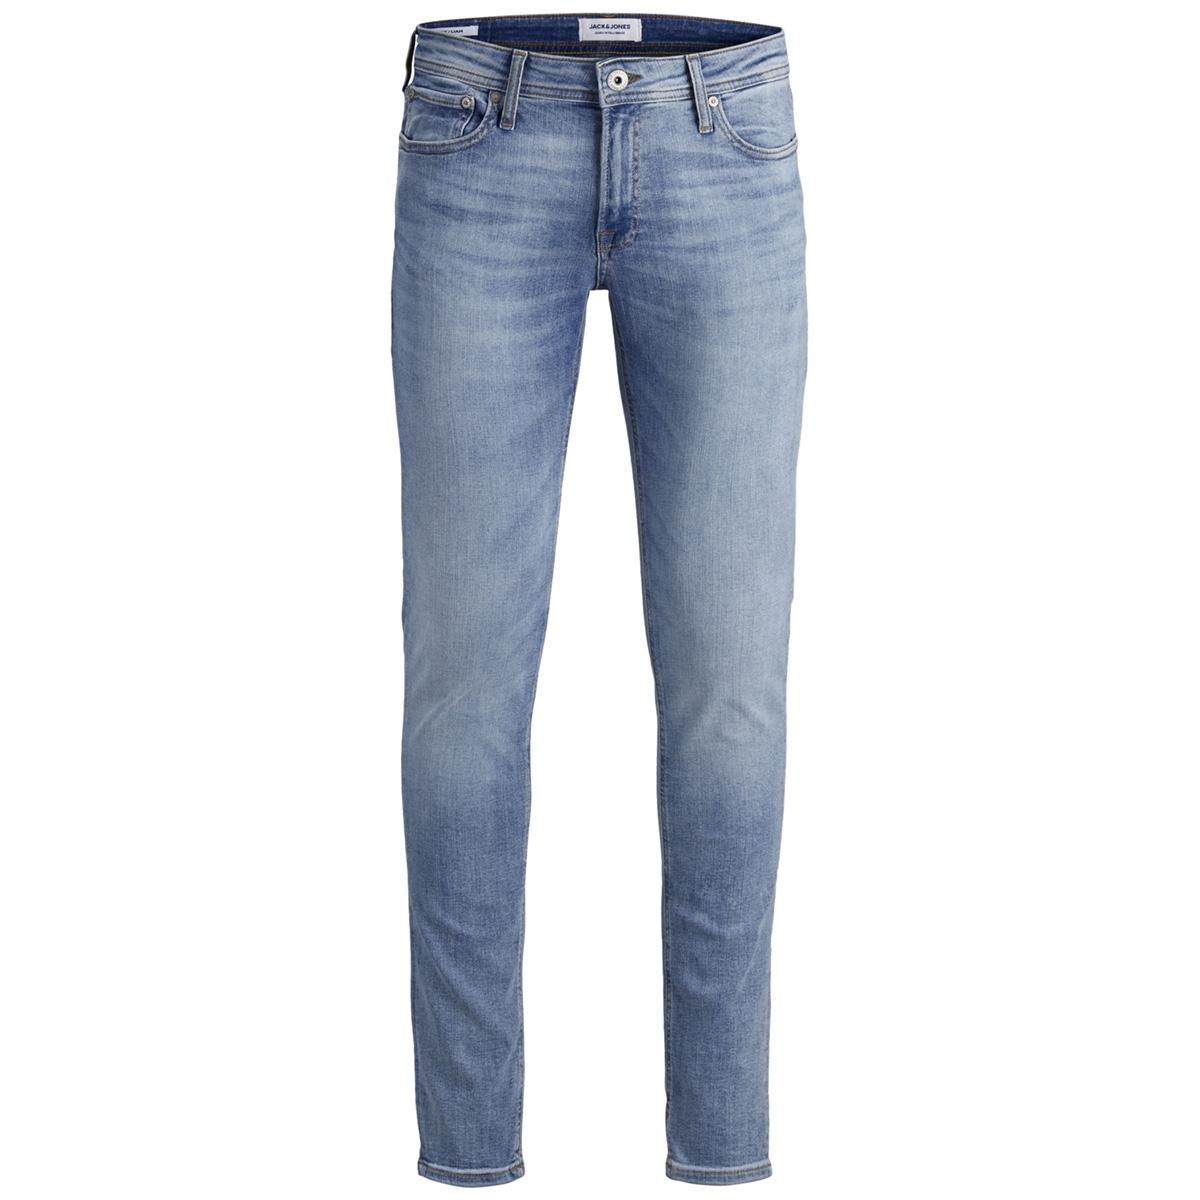 jjiliam jjoriginal am 792 50sps noos 12149678 jack & jones jeans blue denim